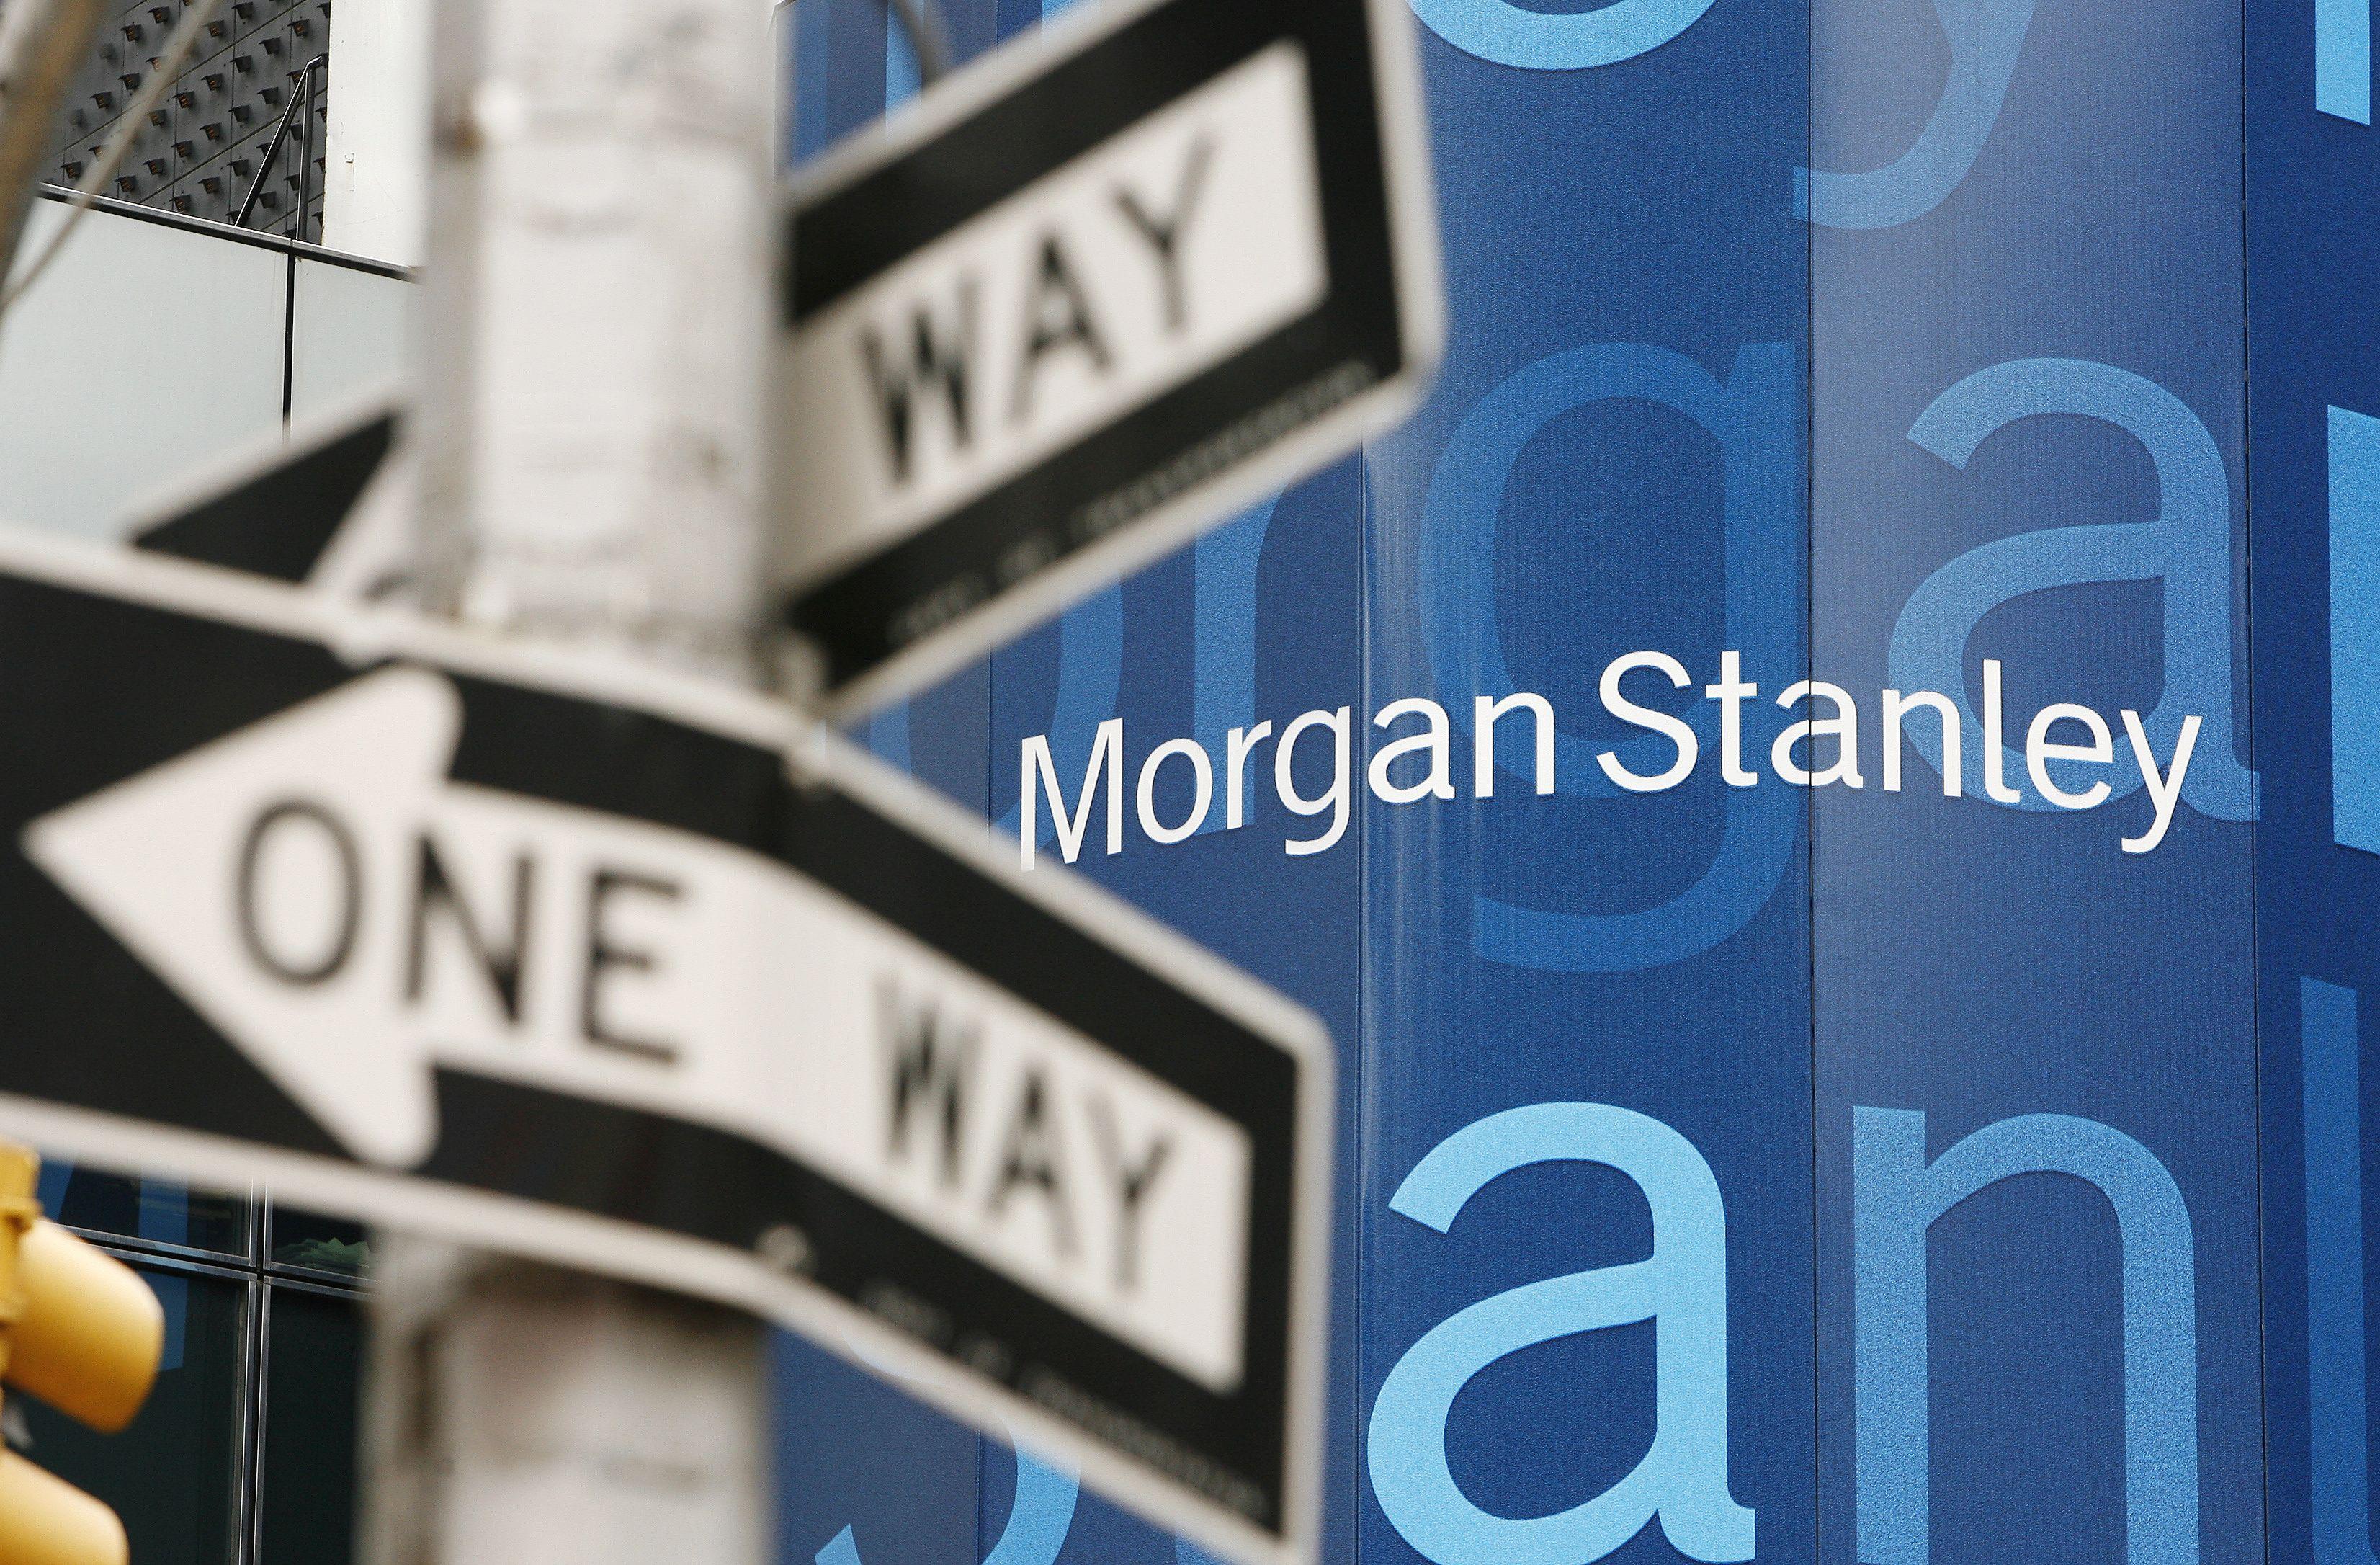 UPDATE 5-Morgan Stanley shares soar after Gorman boosts performance targets